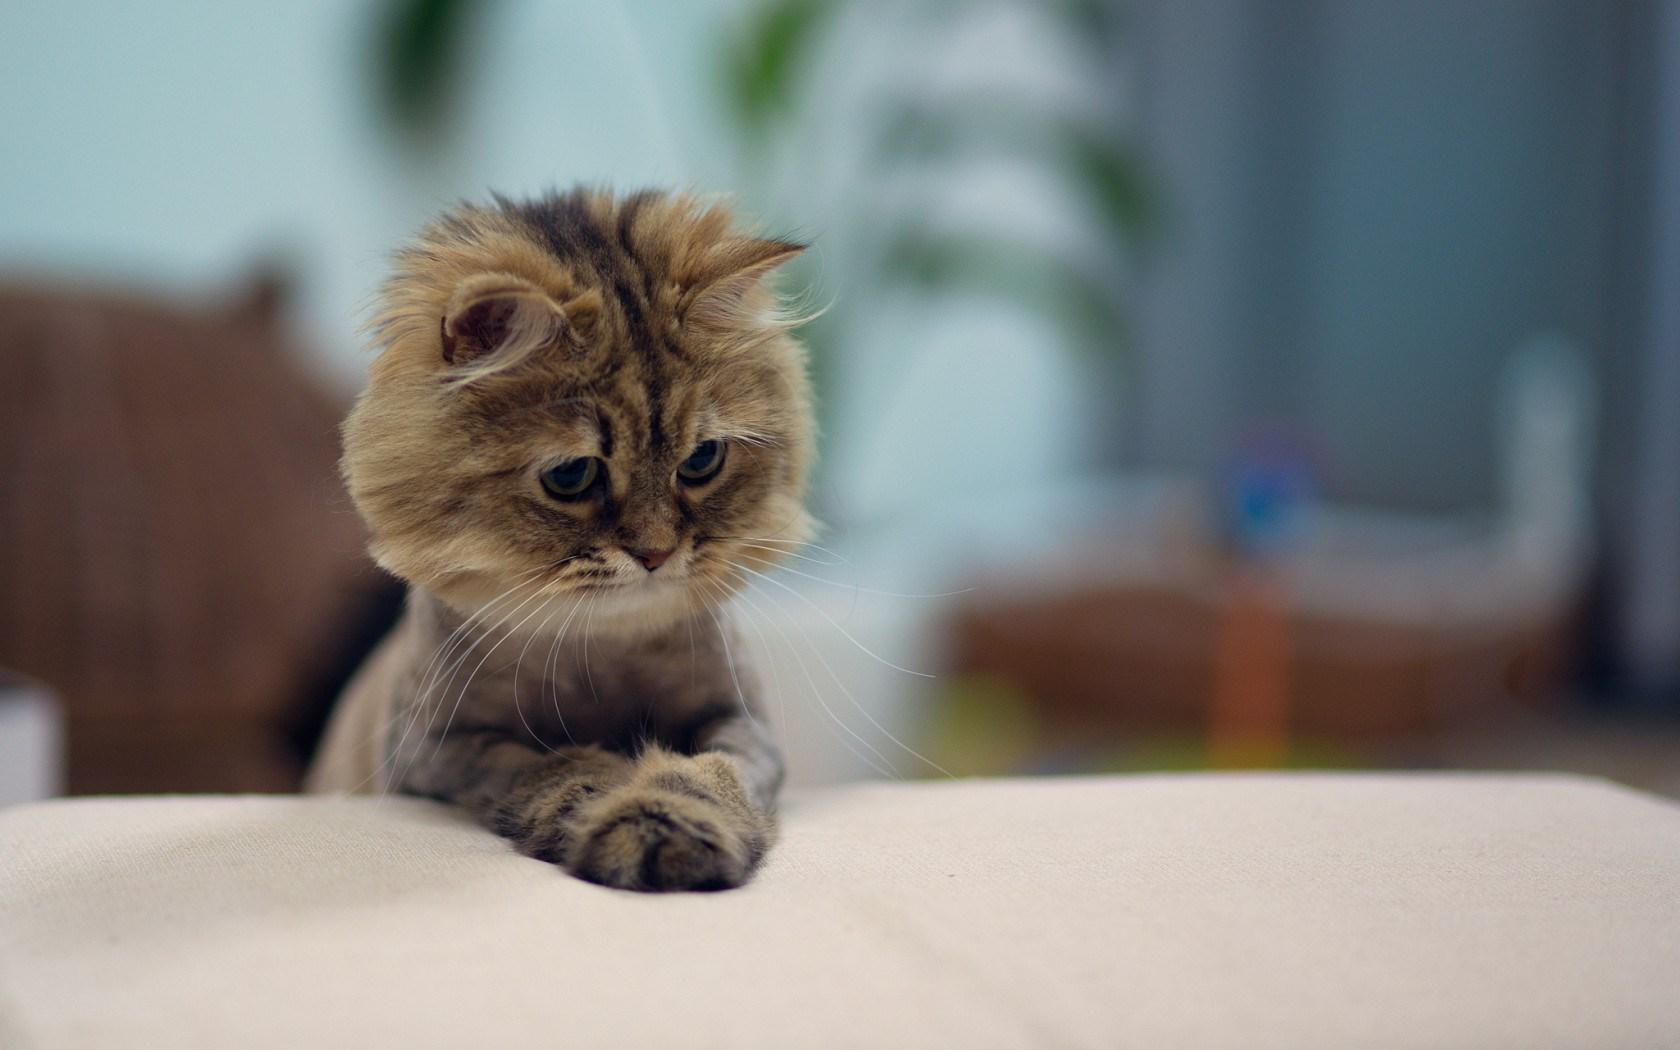 Close-Up Sweet Cat Photo